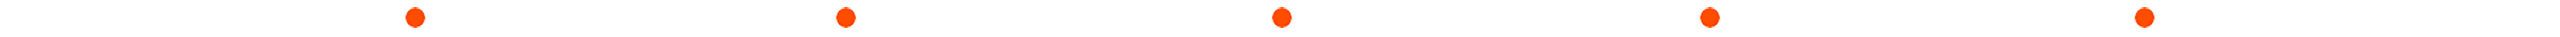 Leyton-legal-societe-avocats-onelaw-AT/MP-suivi-actions-engagées